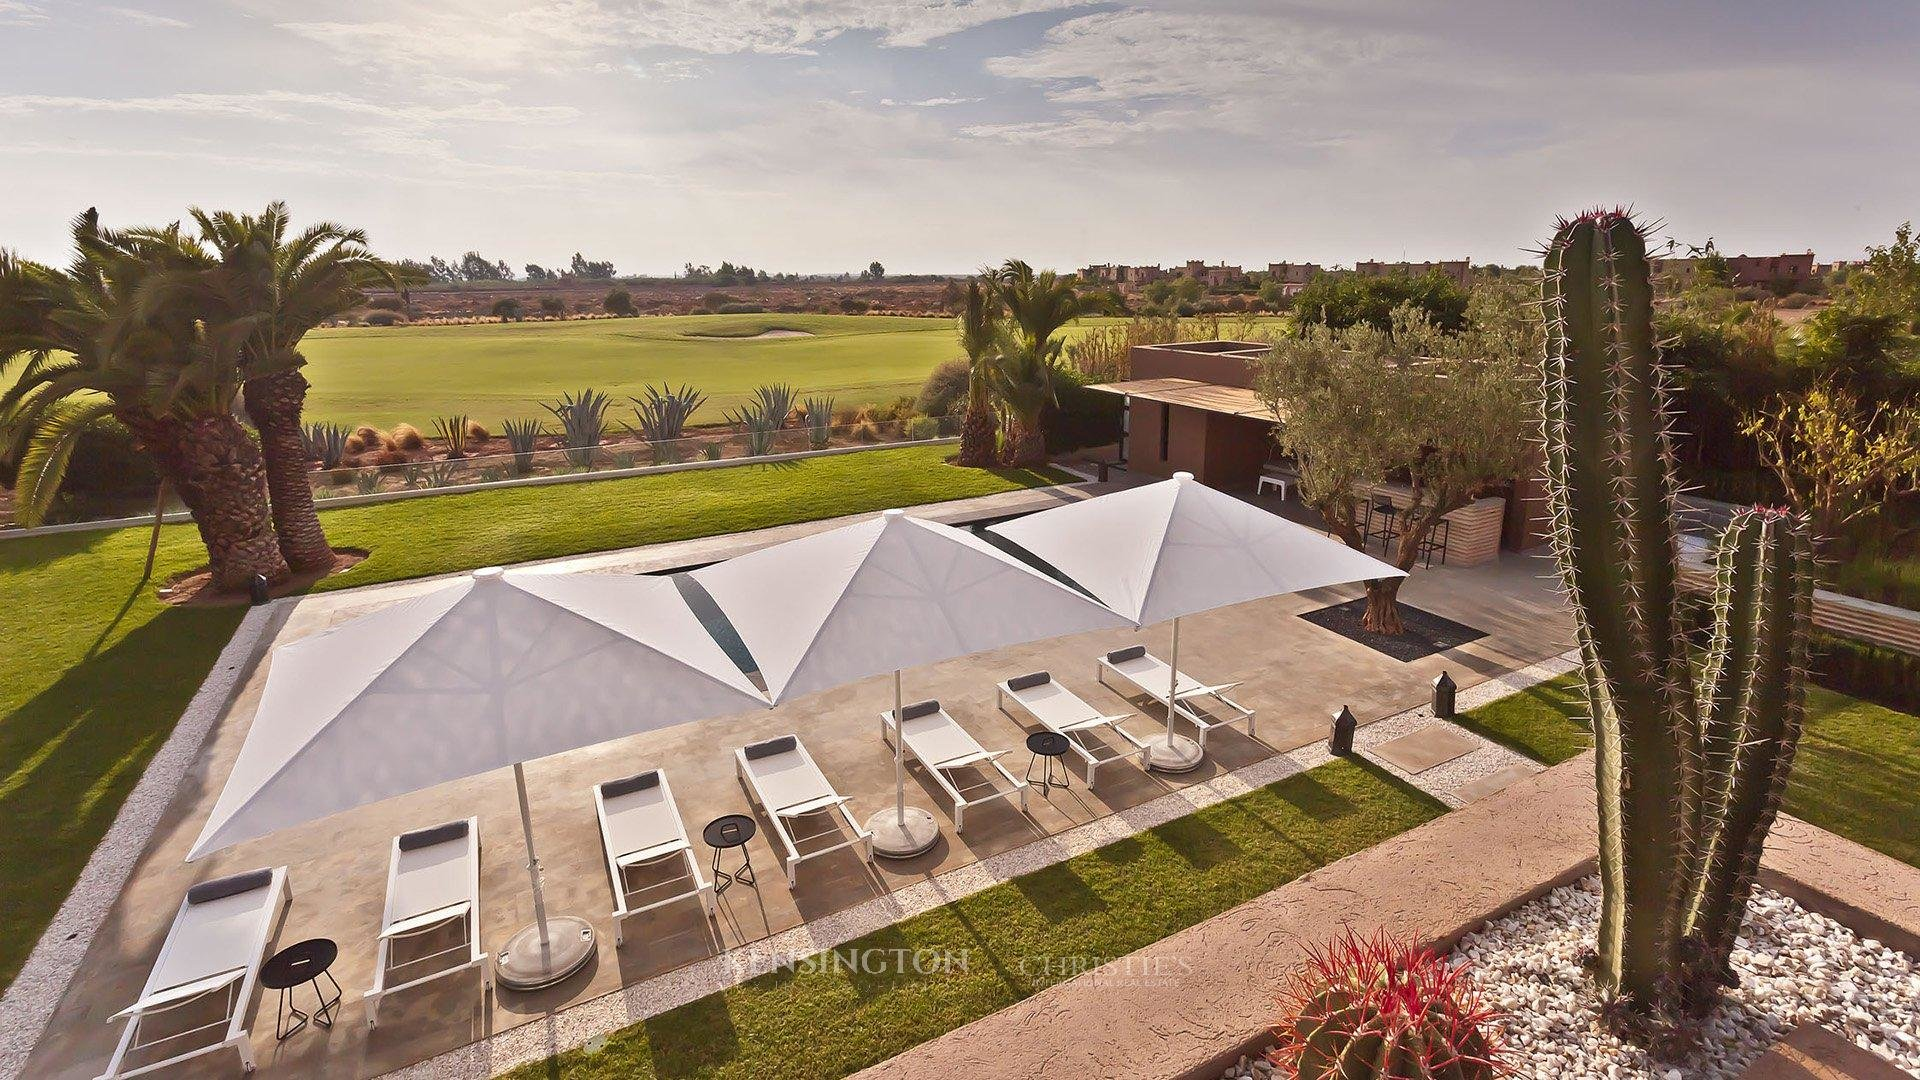 KPPM00993: Villa Boudour Luxury Villa Marrakech Morocco